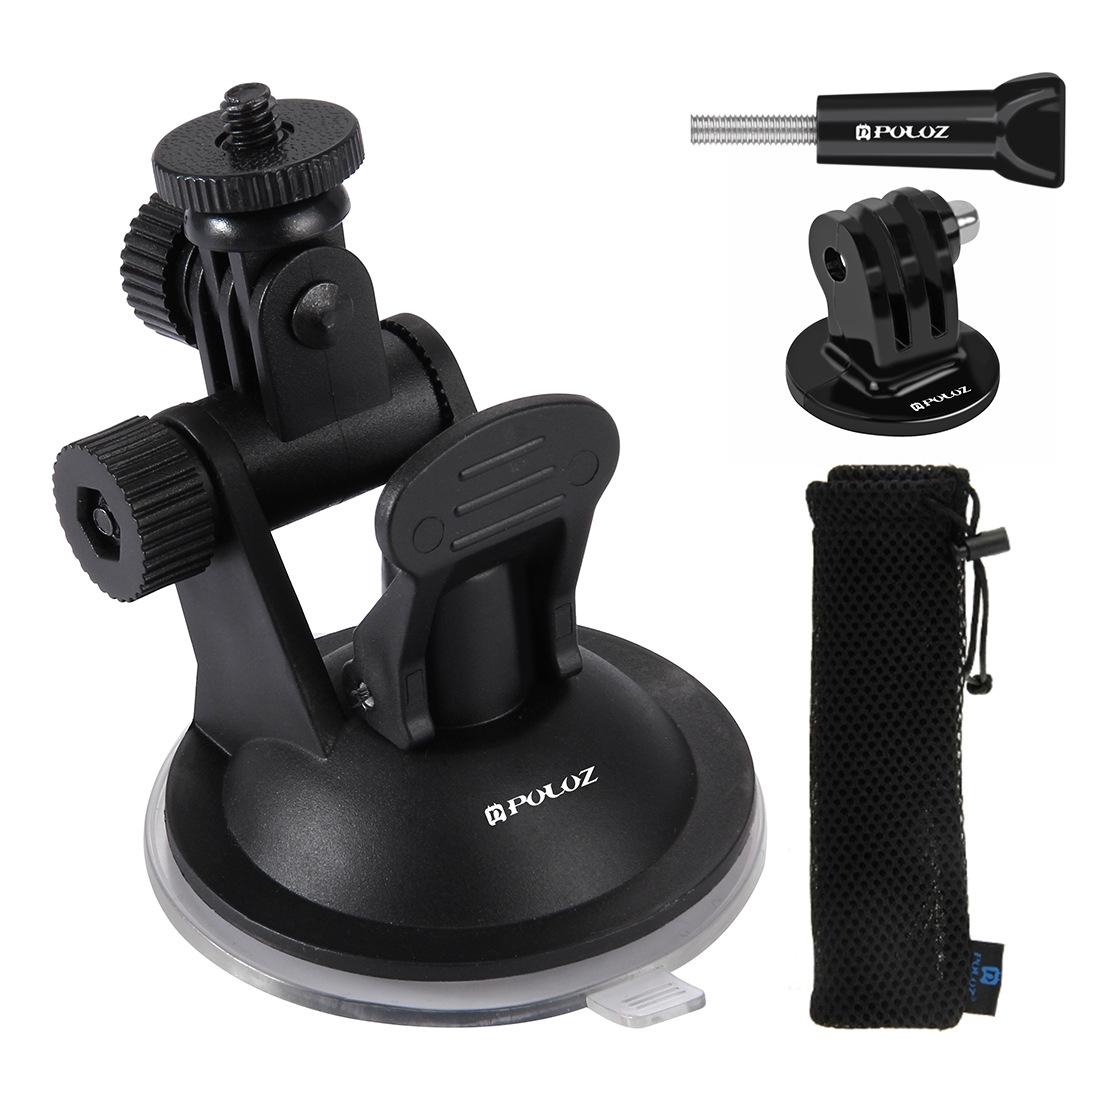 Car Sucker Bracket for GoPro DJI Osmo Action Camera Tripod Mount Record Holder Stand  black